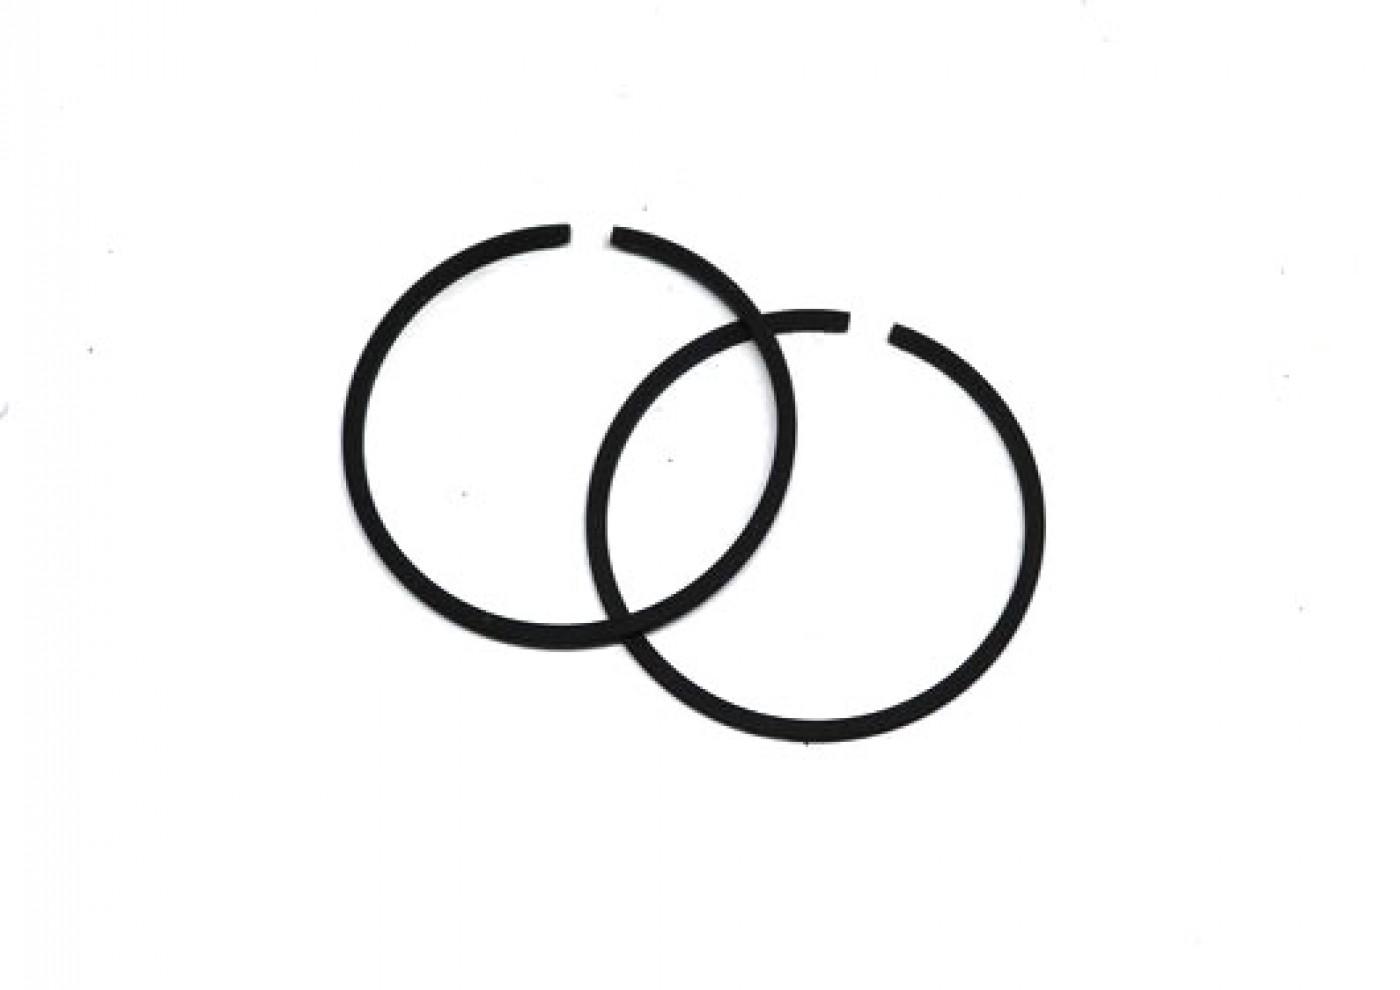 Sada kroužků Partner K750